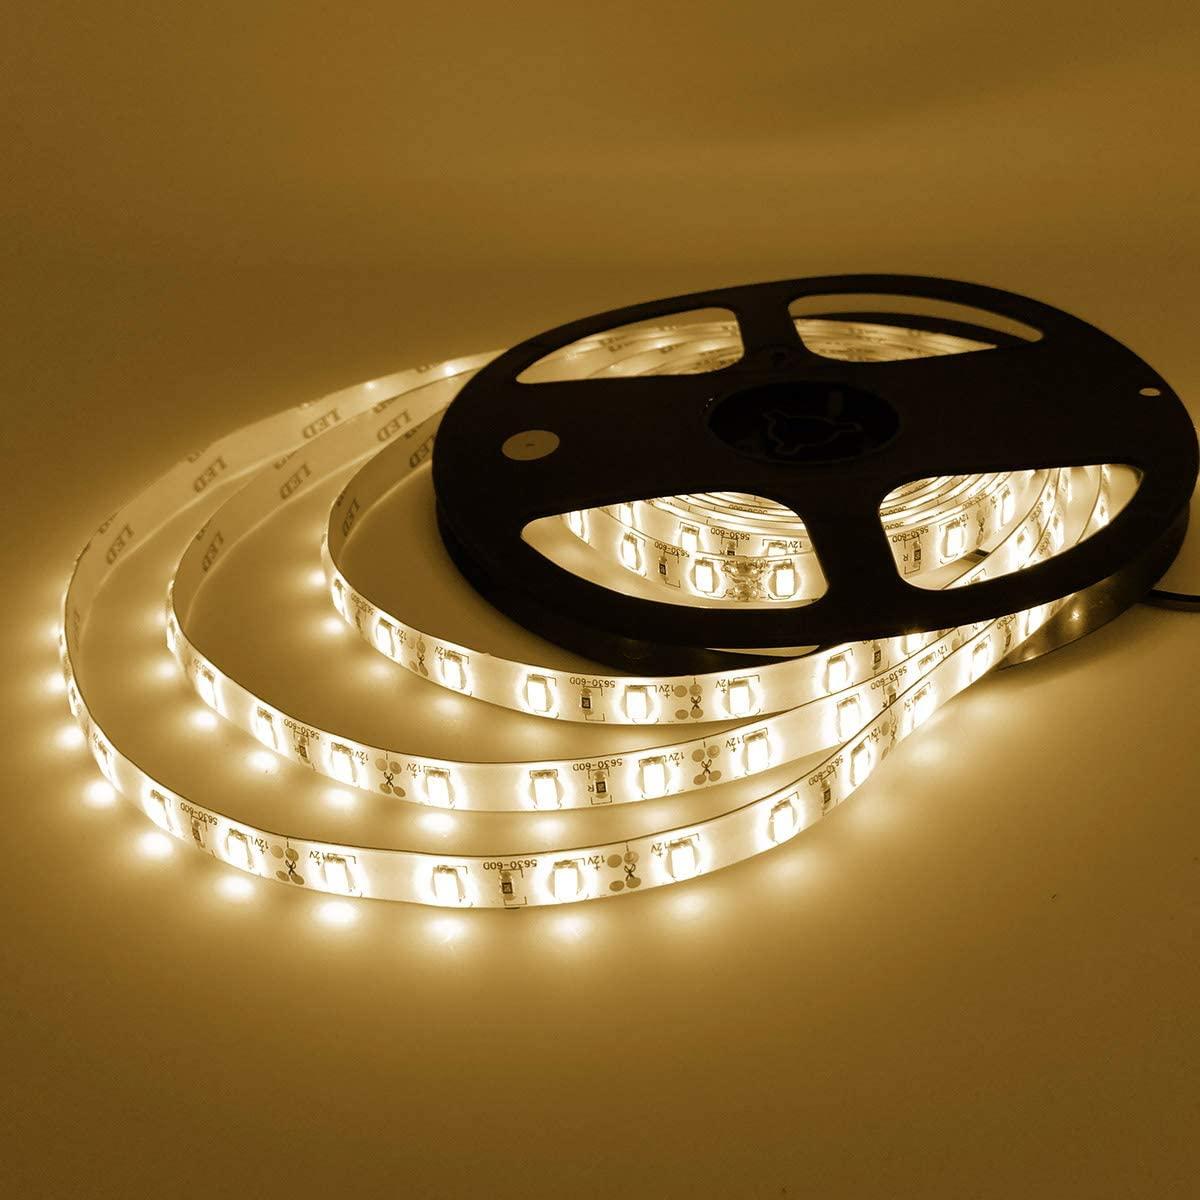 YUNBO LED Strip Light Warm White 3000-3500K, 16.4ft/5M 300 LEDs 12V Waterproof SMD 5630 Flexible LED Tape Light for Bedroom Kitchen Cabinet Lighting Decoration